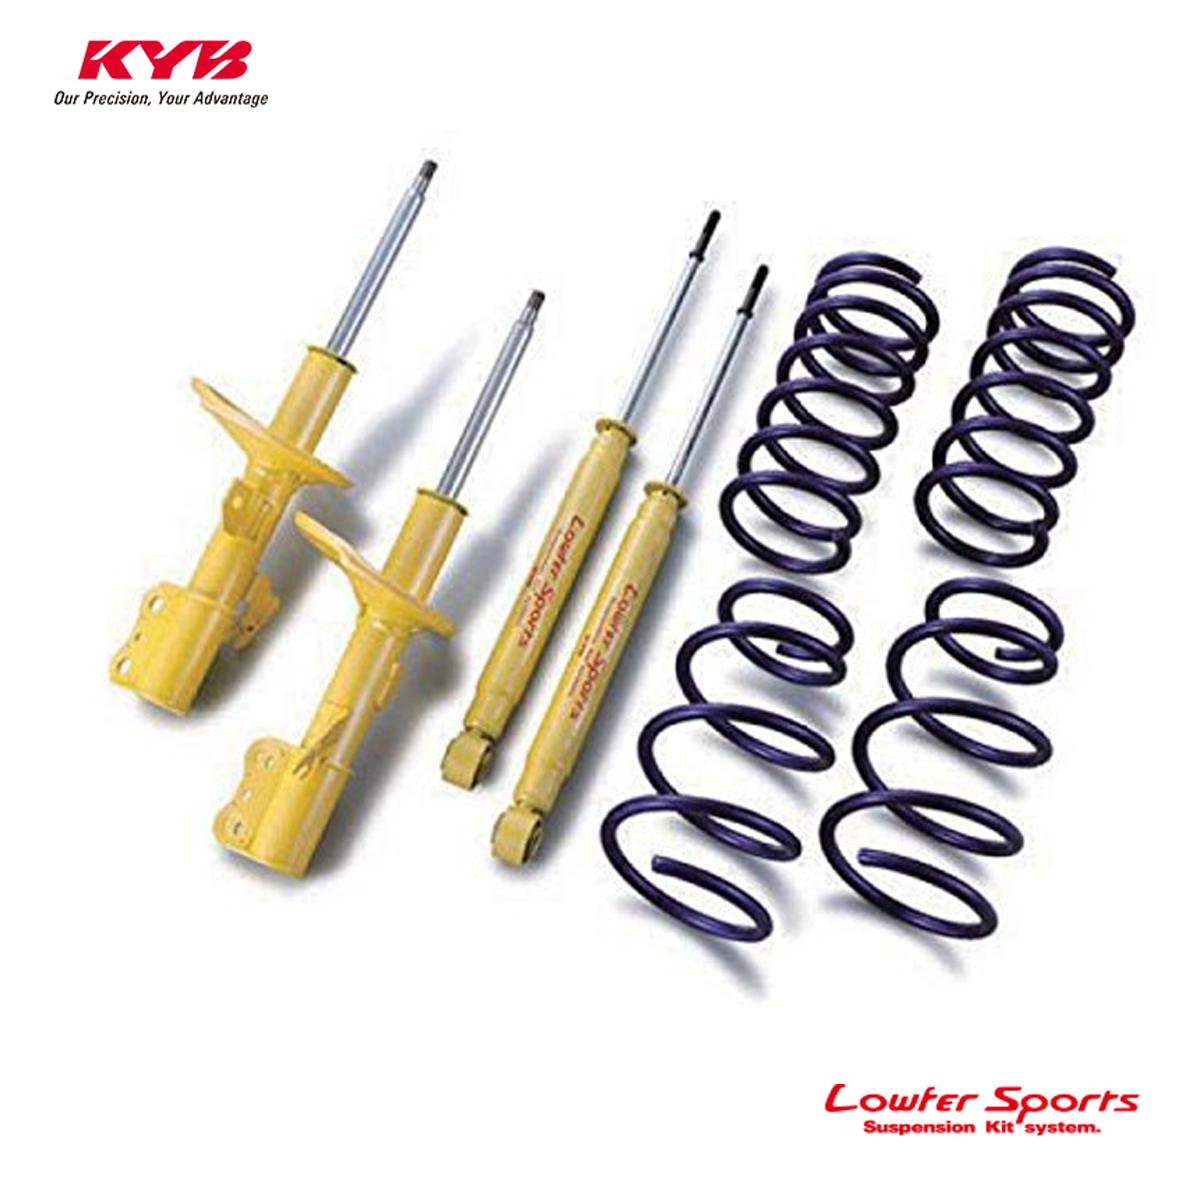 KYB カヤバ エスティマルシーダ CXR10G ショックアブソーバー サスペンションキット Lowfer Sports LKIT-TCR10G 配送先条件有り